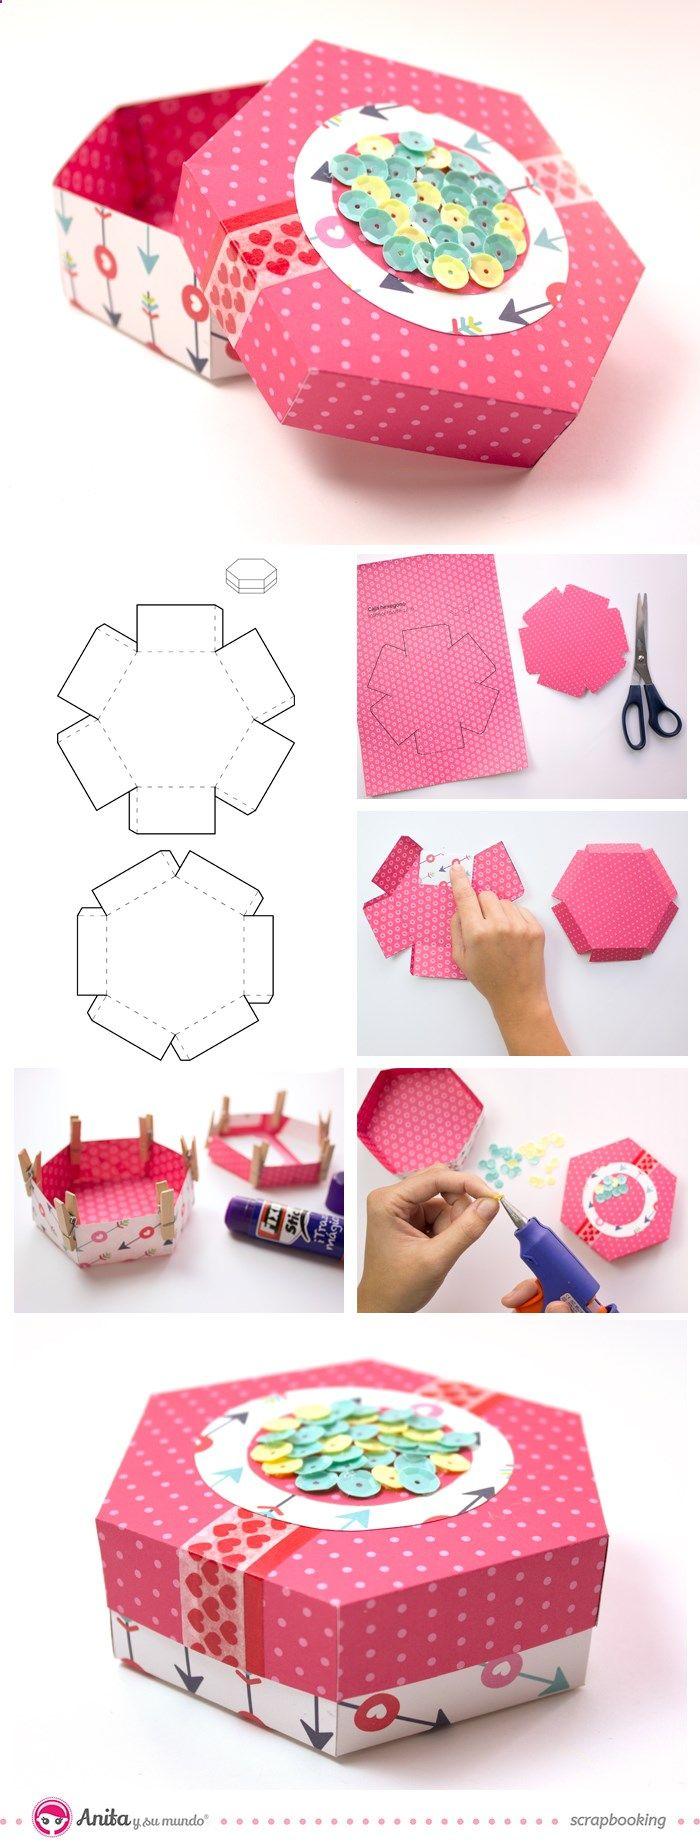 hexagonal gift box | DIY Fun Tips